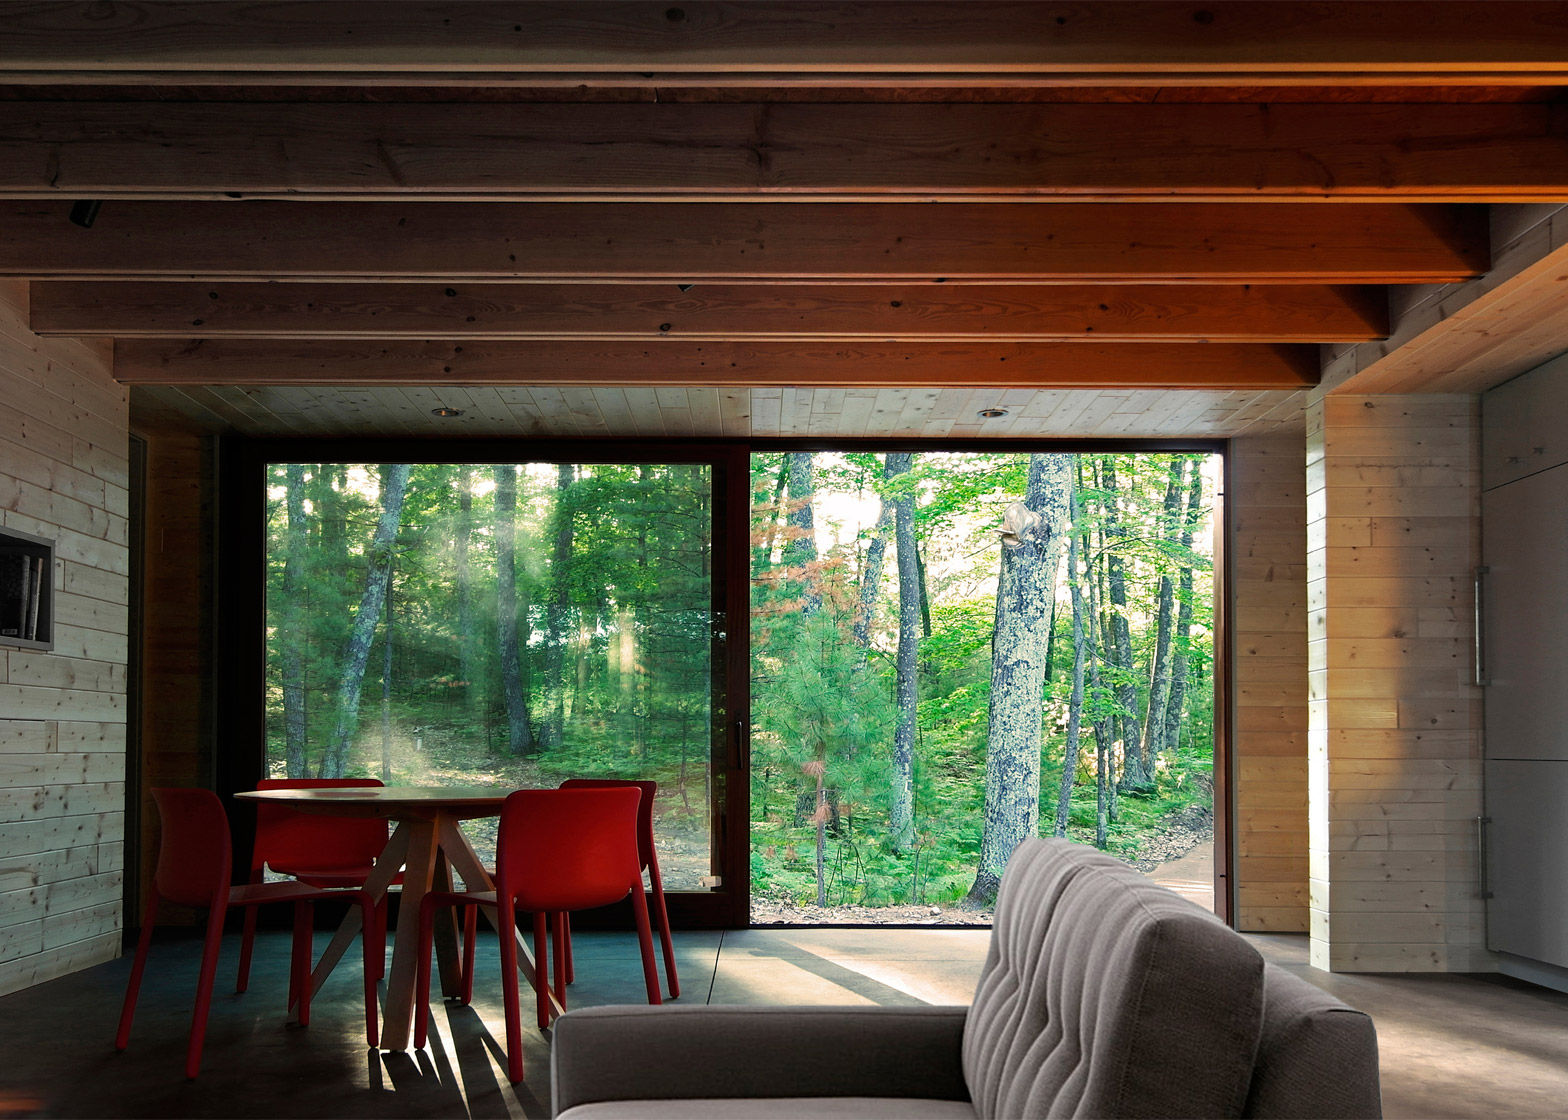 architecture_house_in_forest_design_studia_interiors_osnovadesign_osnova_poltava_06